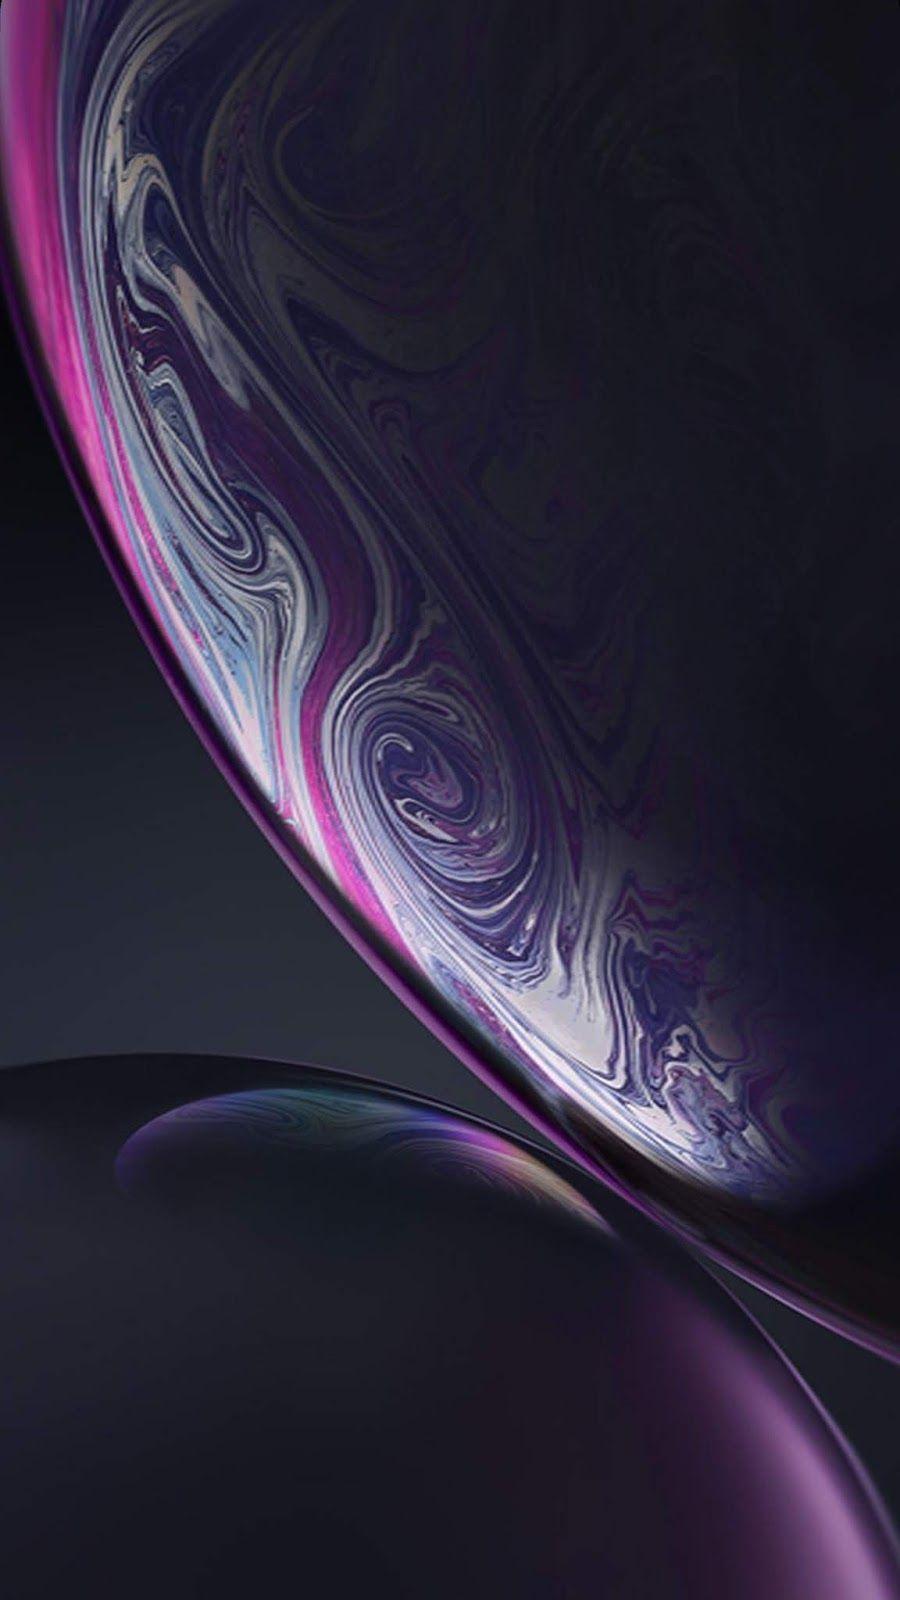 IPhone XR Wallpapers (4 Color) Фони для iphone, Шпалери